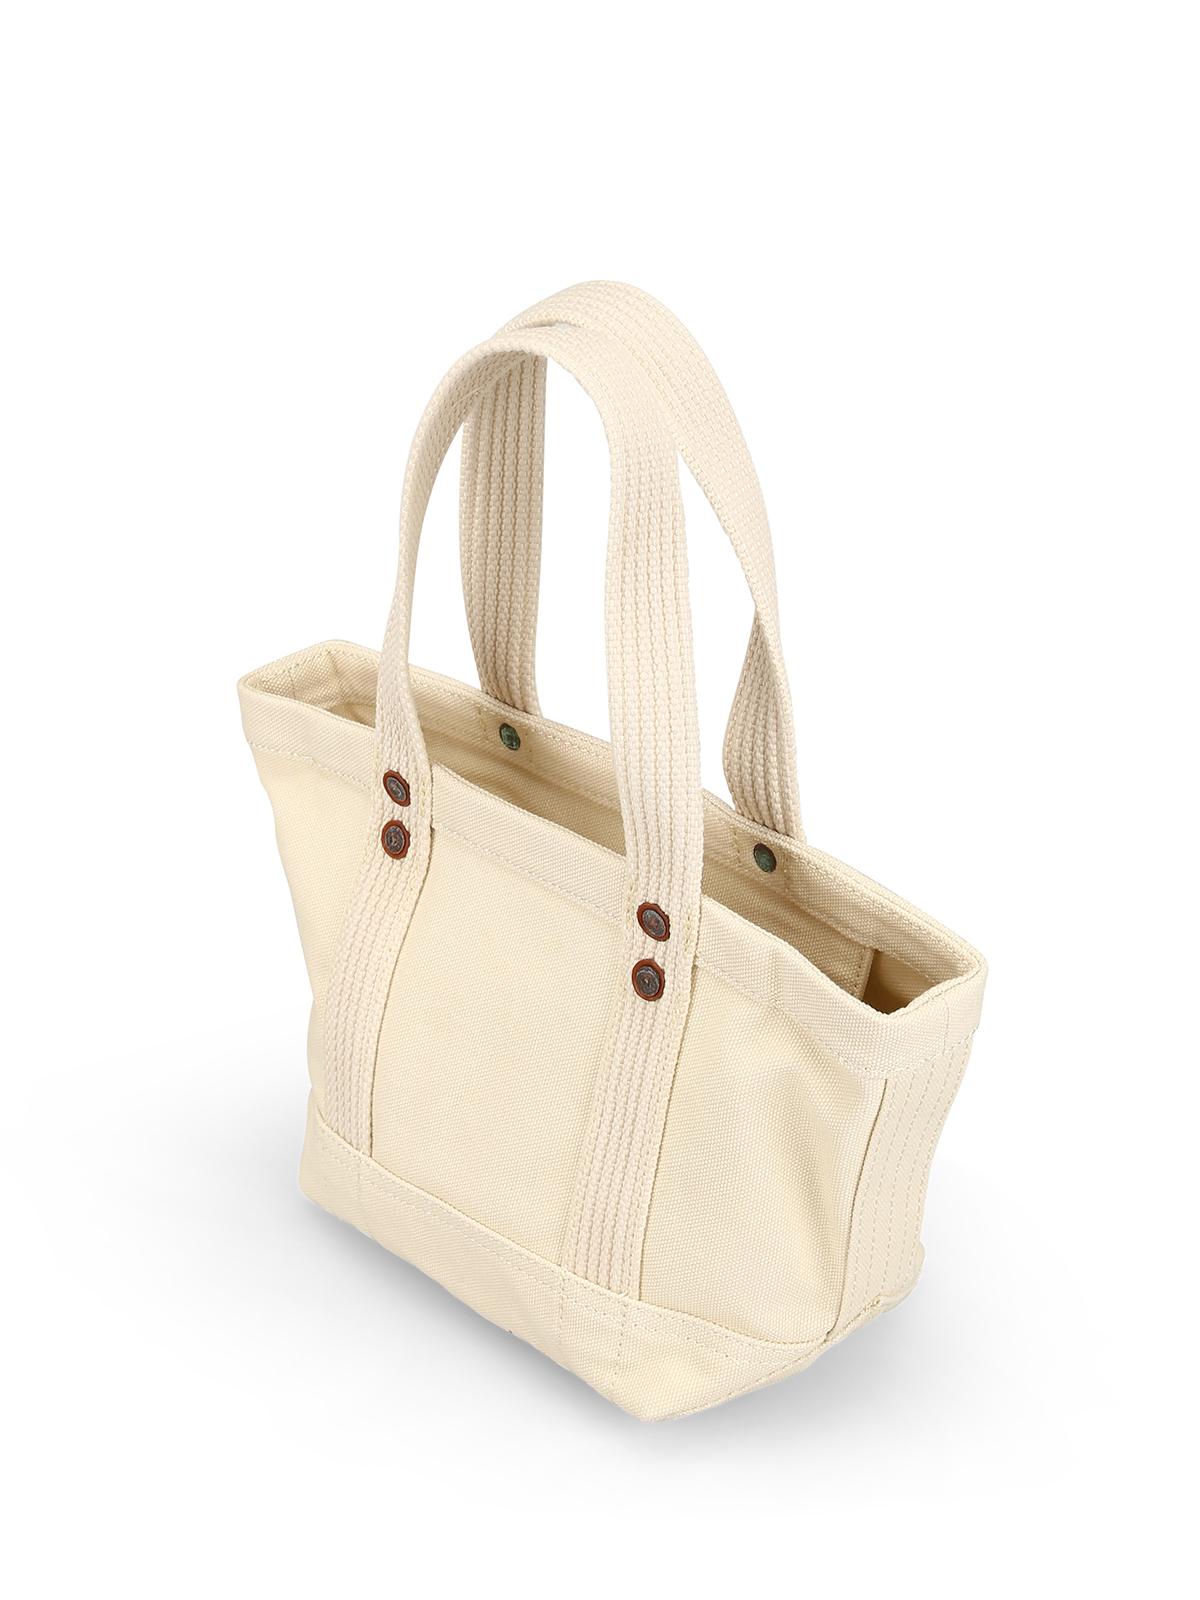 6d1b9026bcfc iKRIX POLO RALPH LAUREN  totes bags - Teddy Bear patch cream cotton mini  tote bag